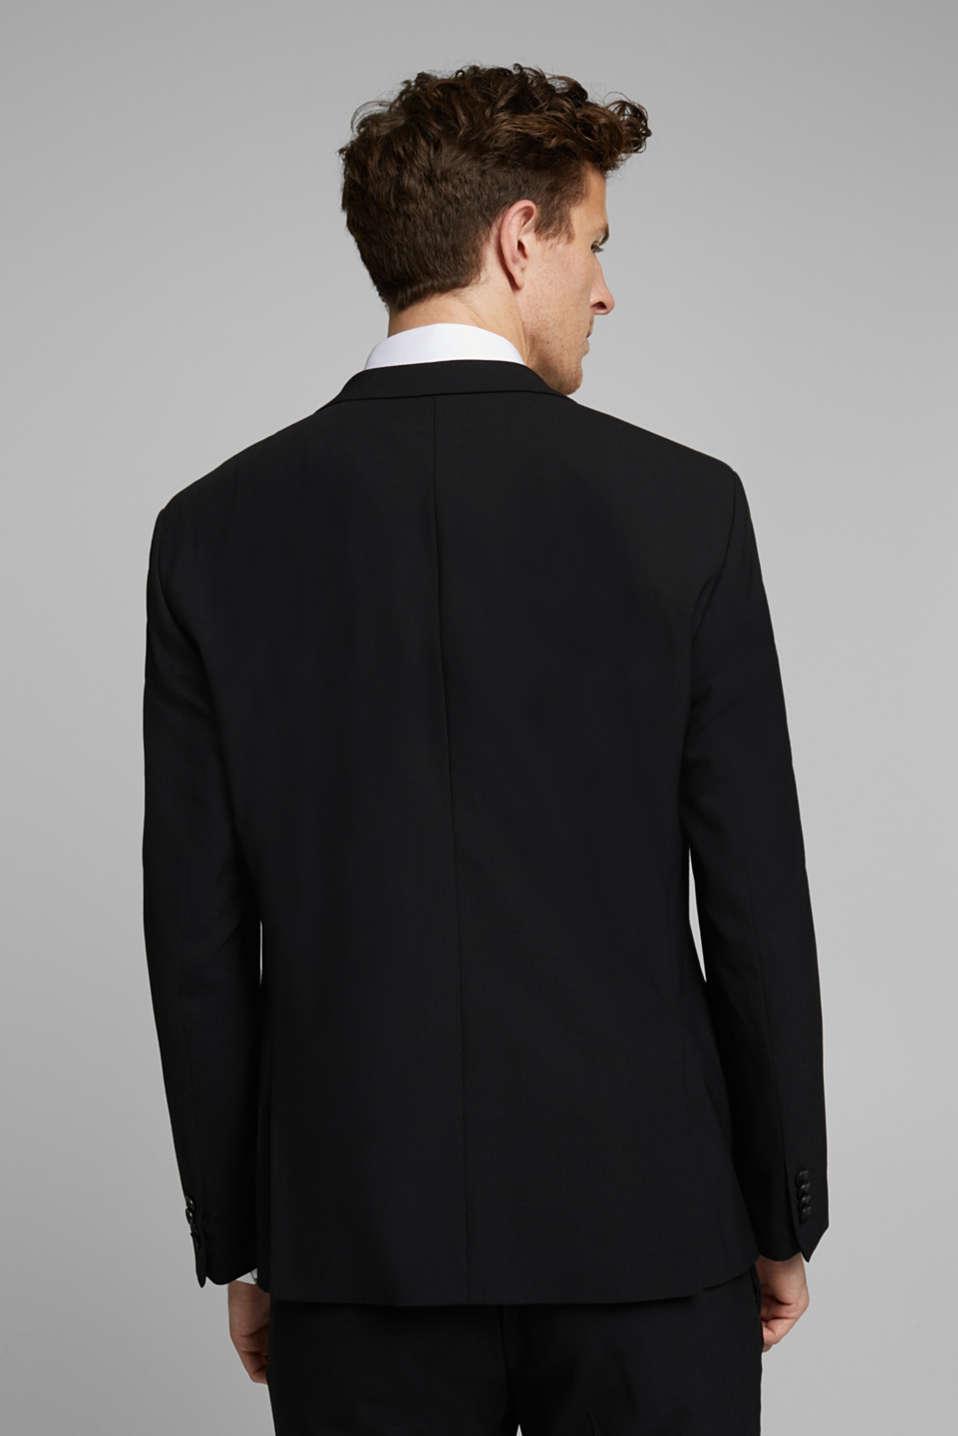 ACTIVE SUIT tailored jacket, wool blend, BLACK, detail image number 3